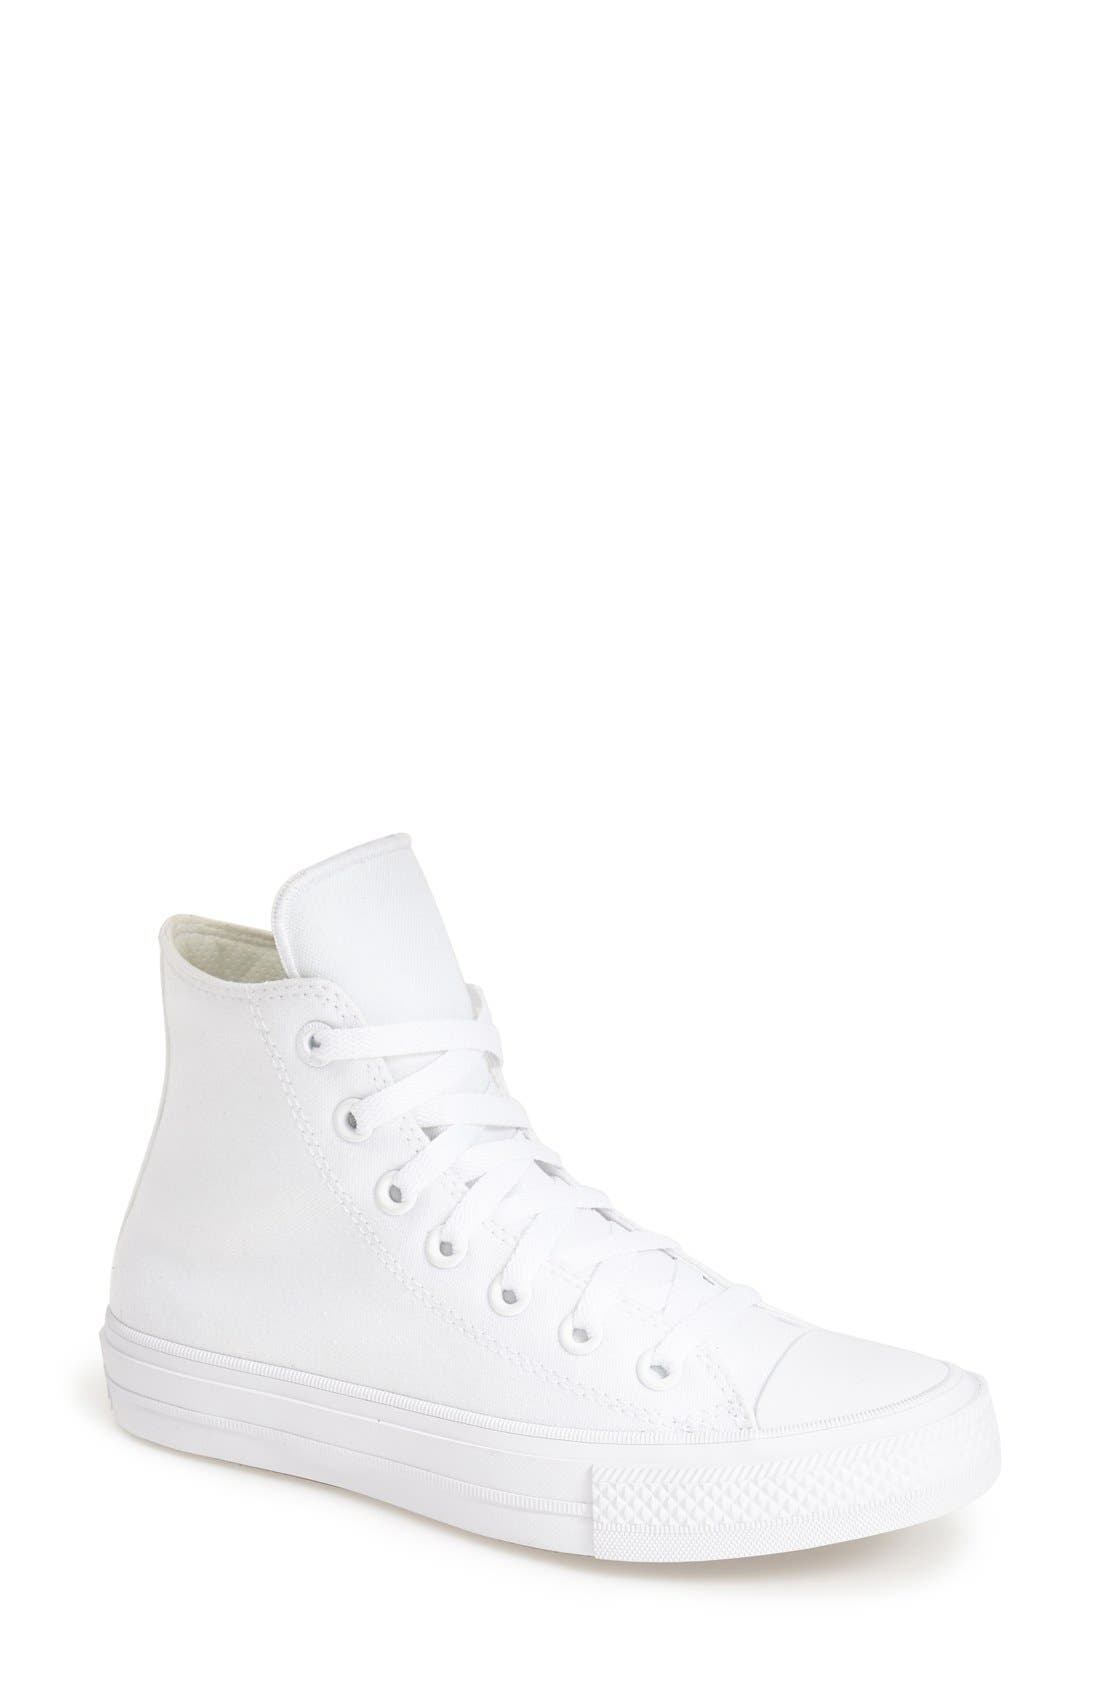 Alternate Image 1 Selected - Converse Chuck Taylor® All Star® 'Chuck II' High Top Sneaker (Women)